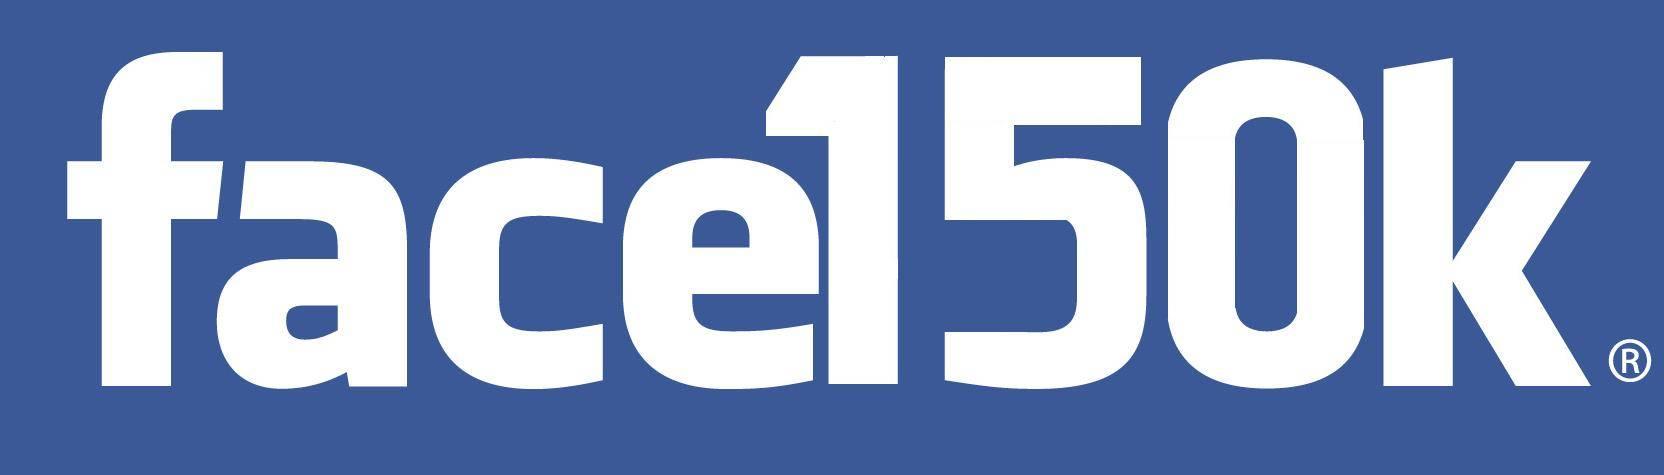 facebook 150 contactos